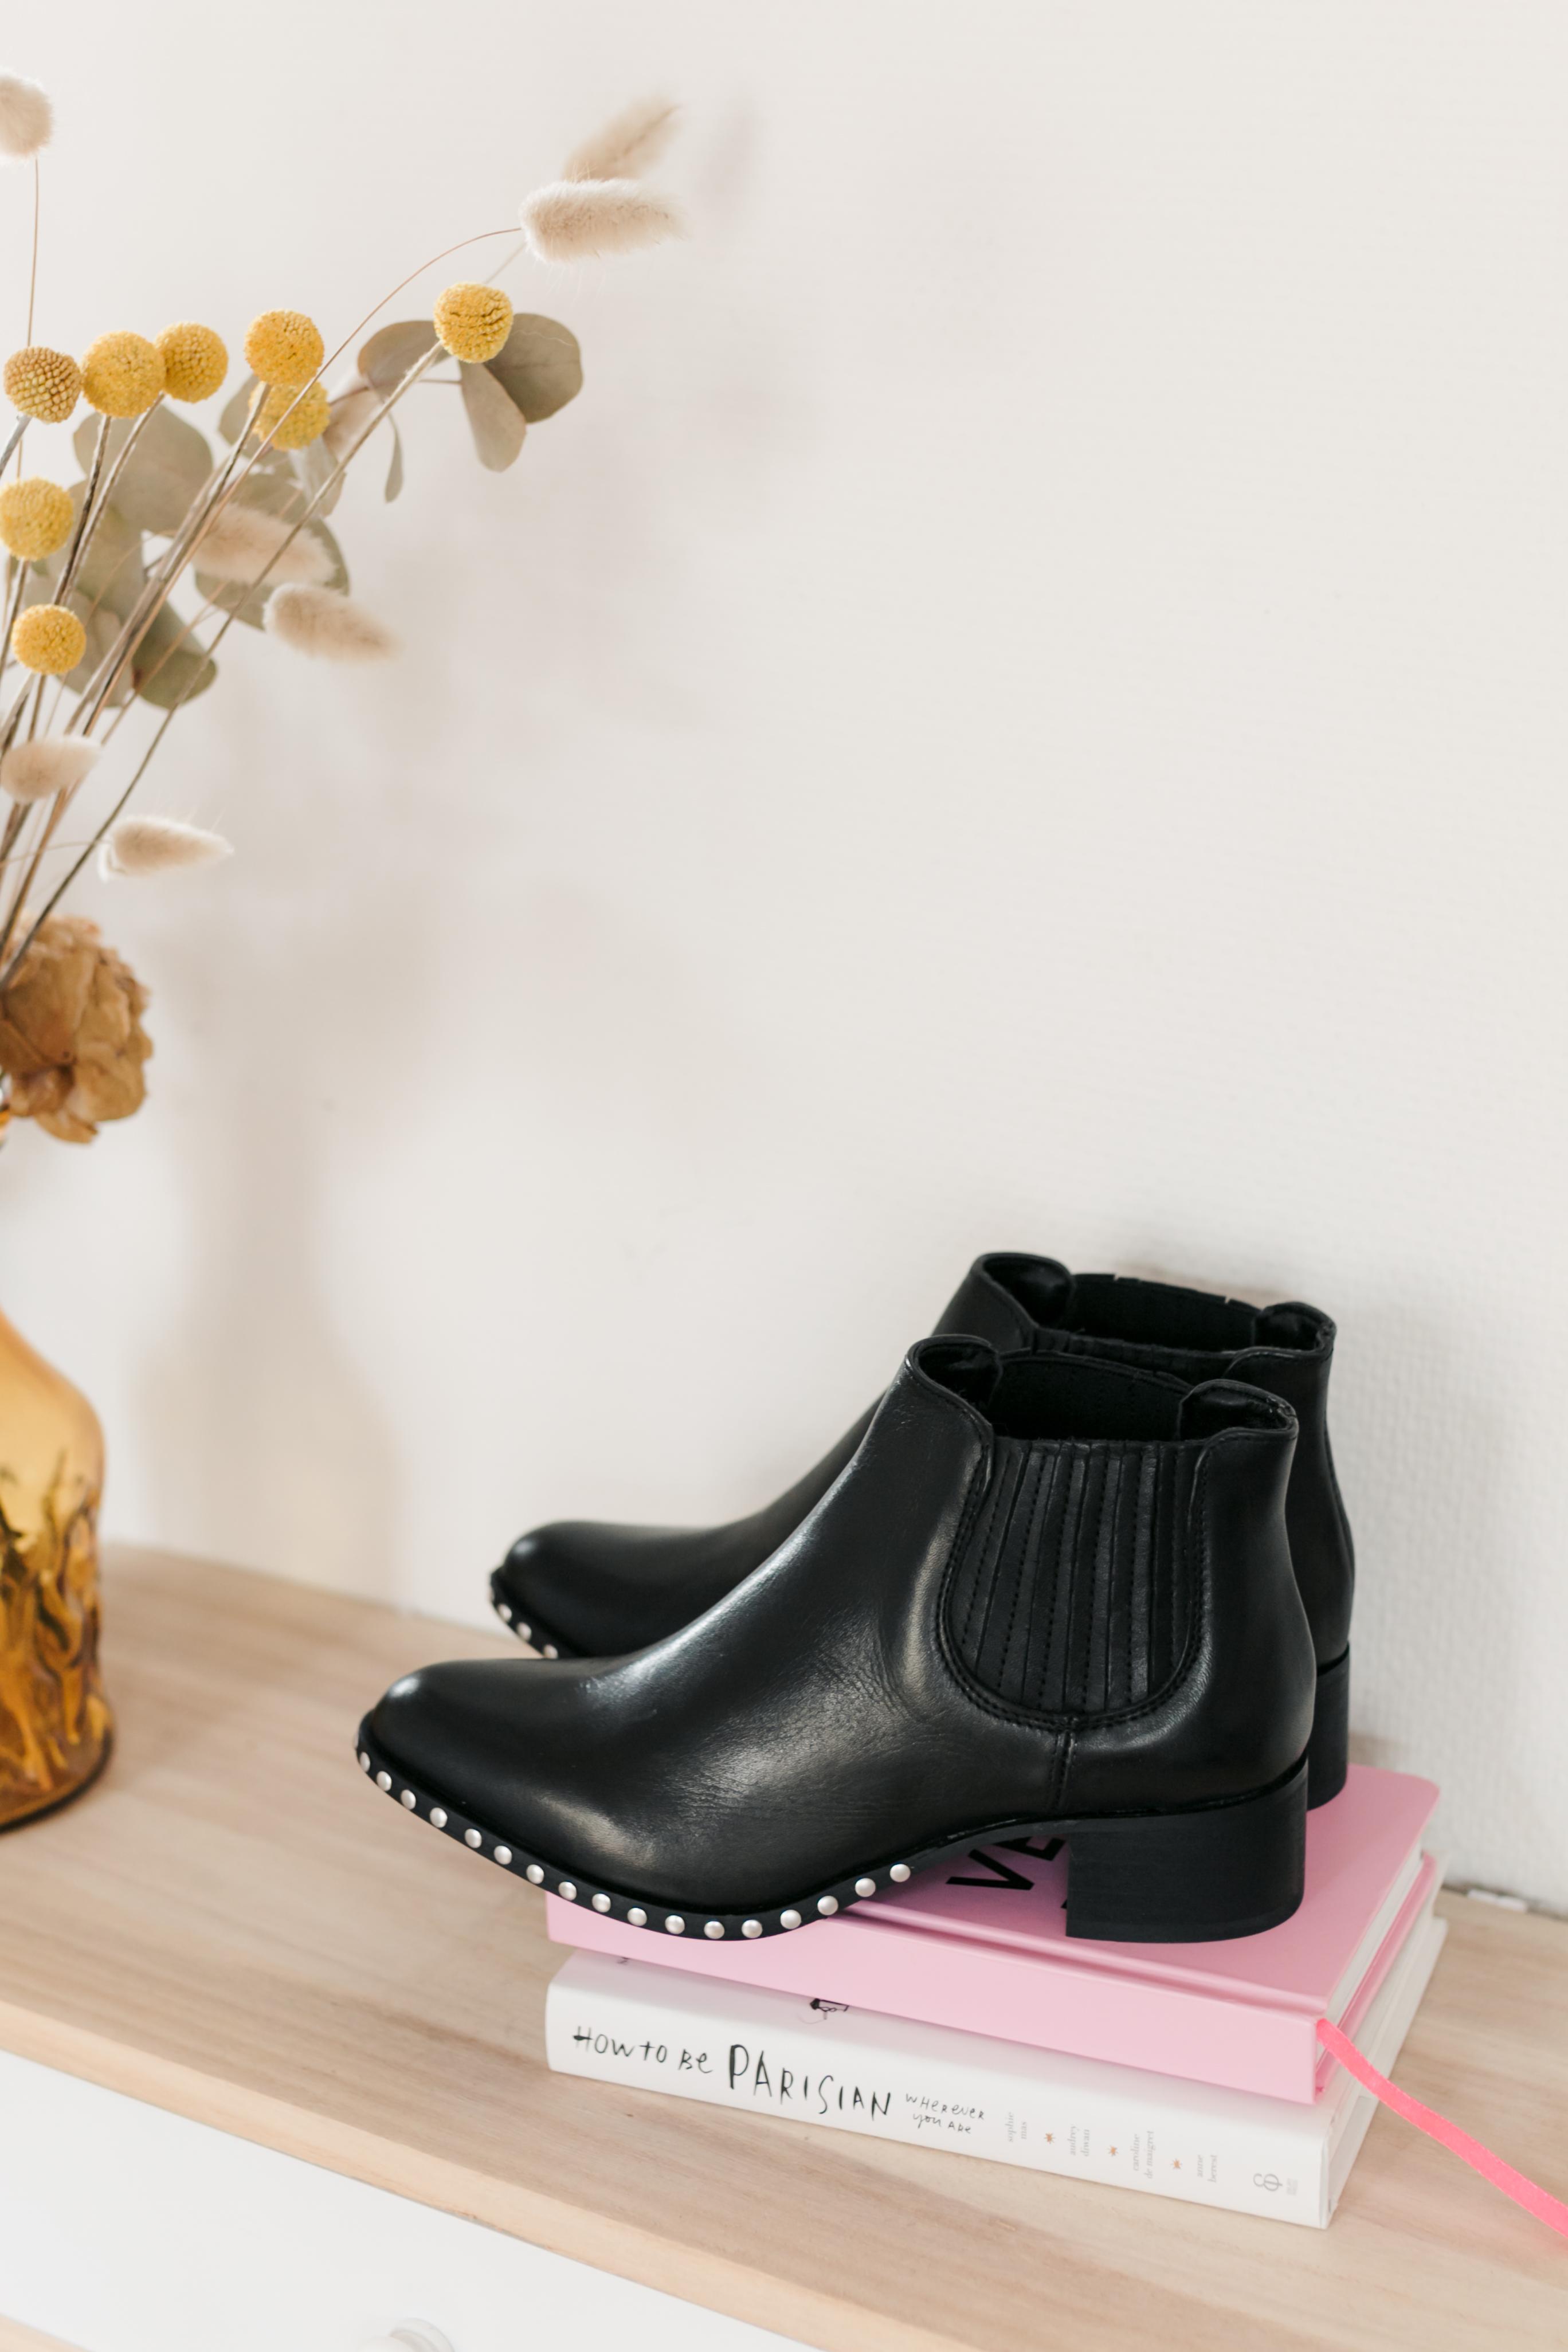 diy-bottines-cloutees-stud-boots-i-sp4nkblog-12-1